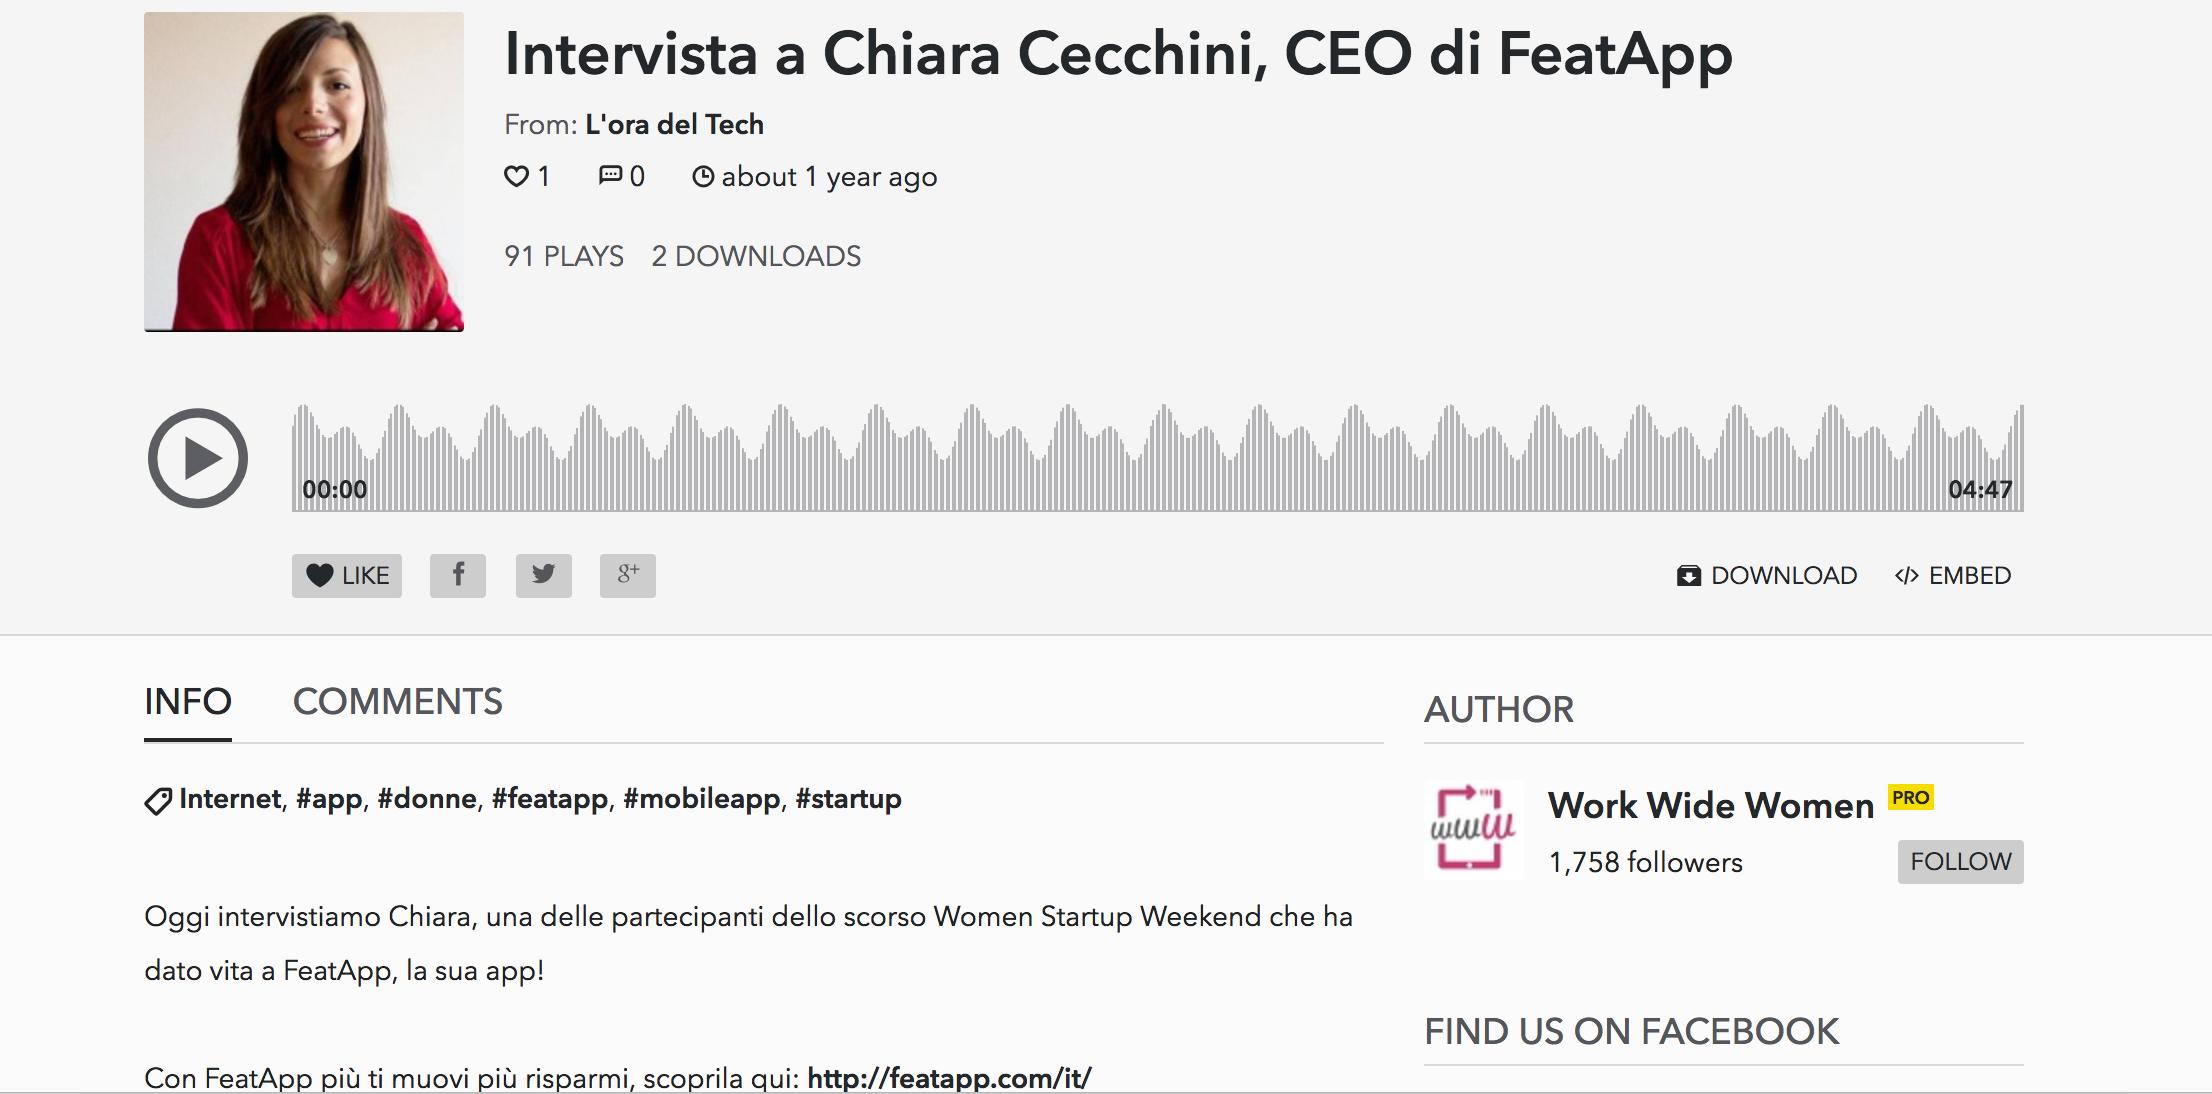 Interview with Chiara cecchini - World Wide Women, July 2016